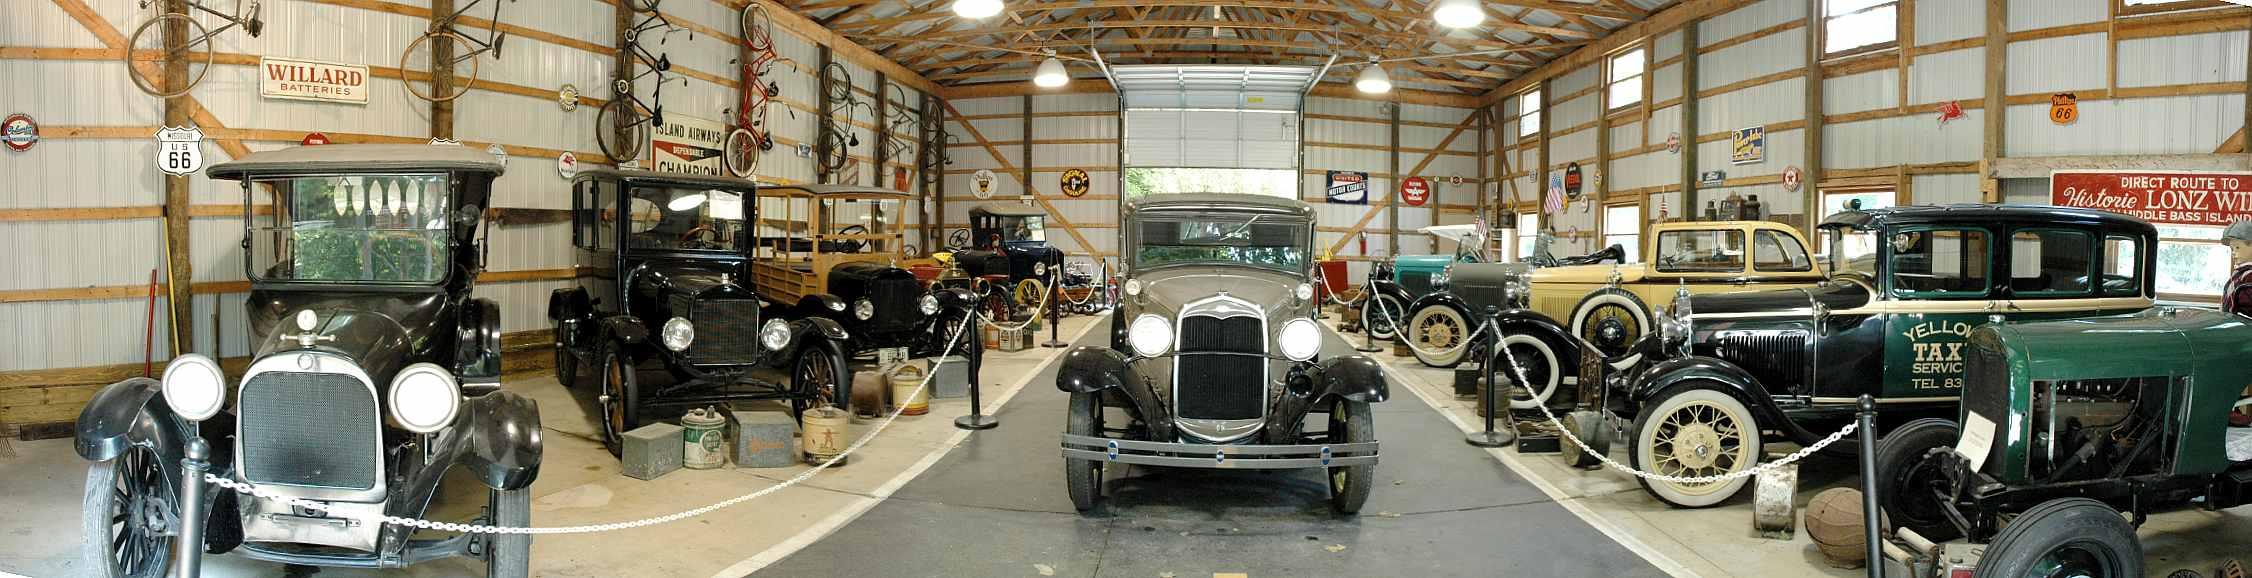 Perrys Cave Classic Car Museum Panorama - Classic car museum